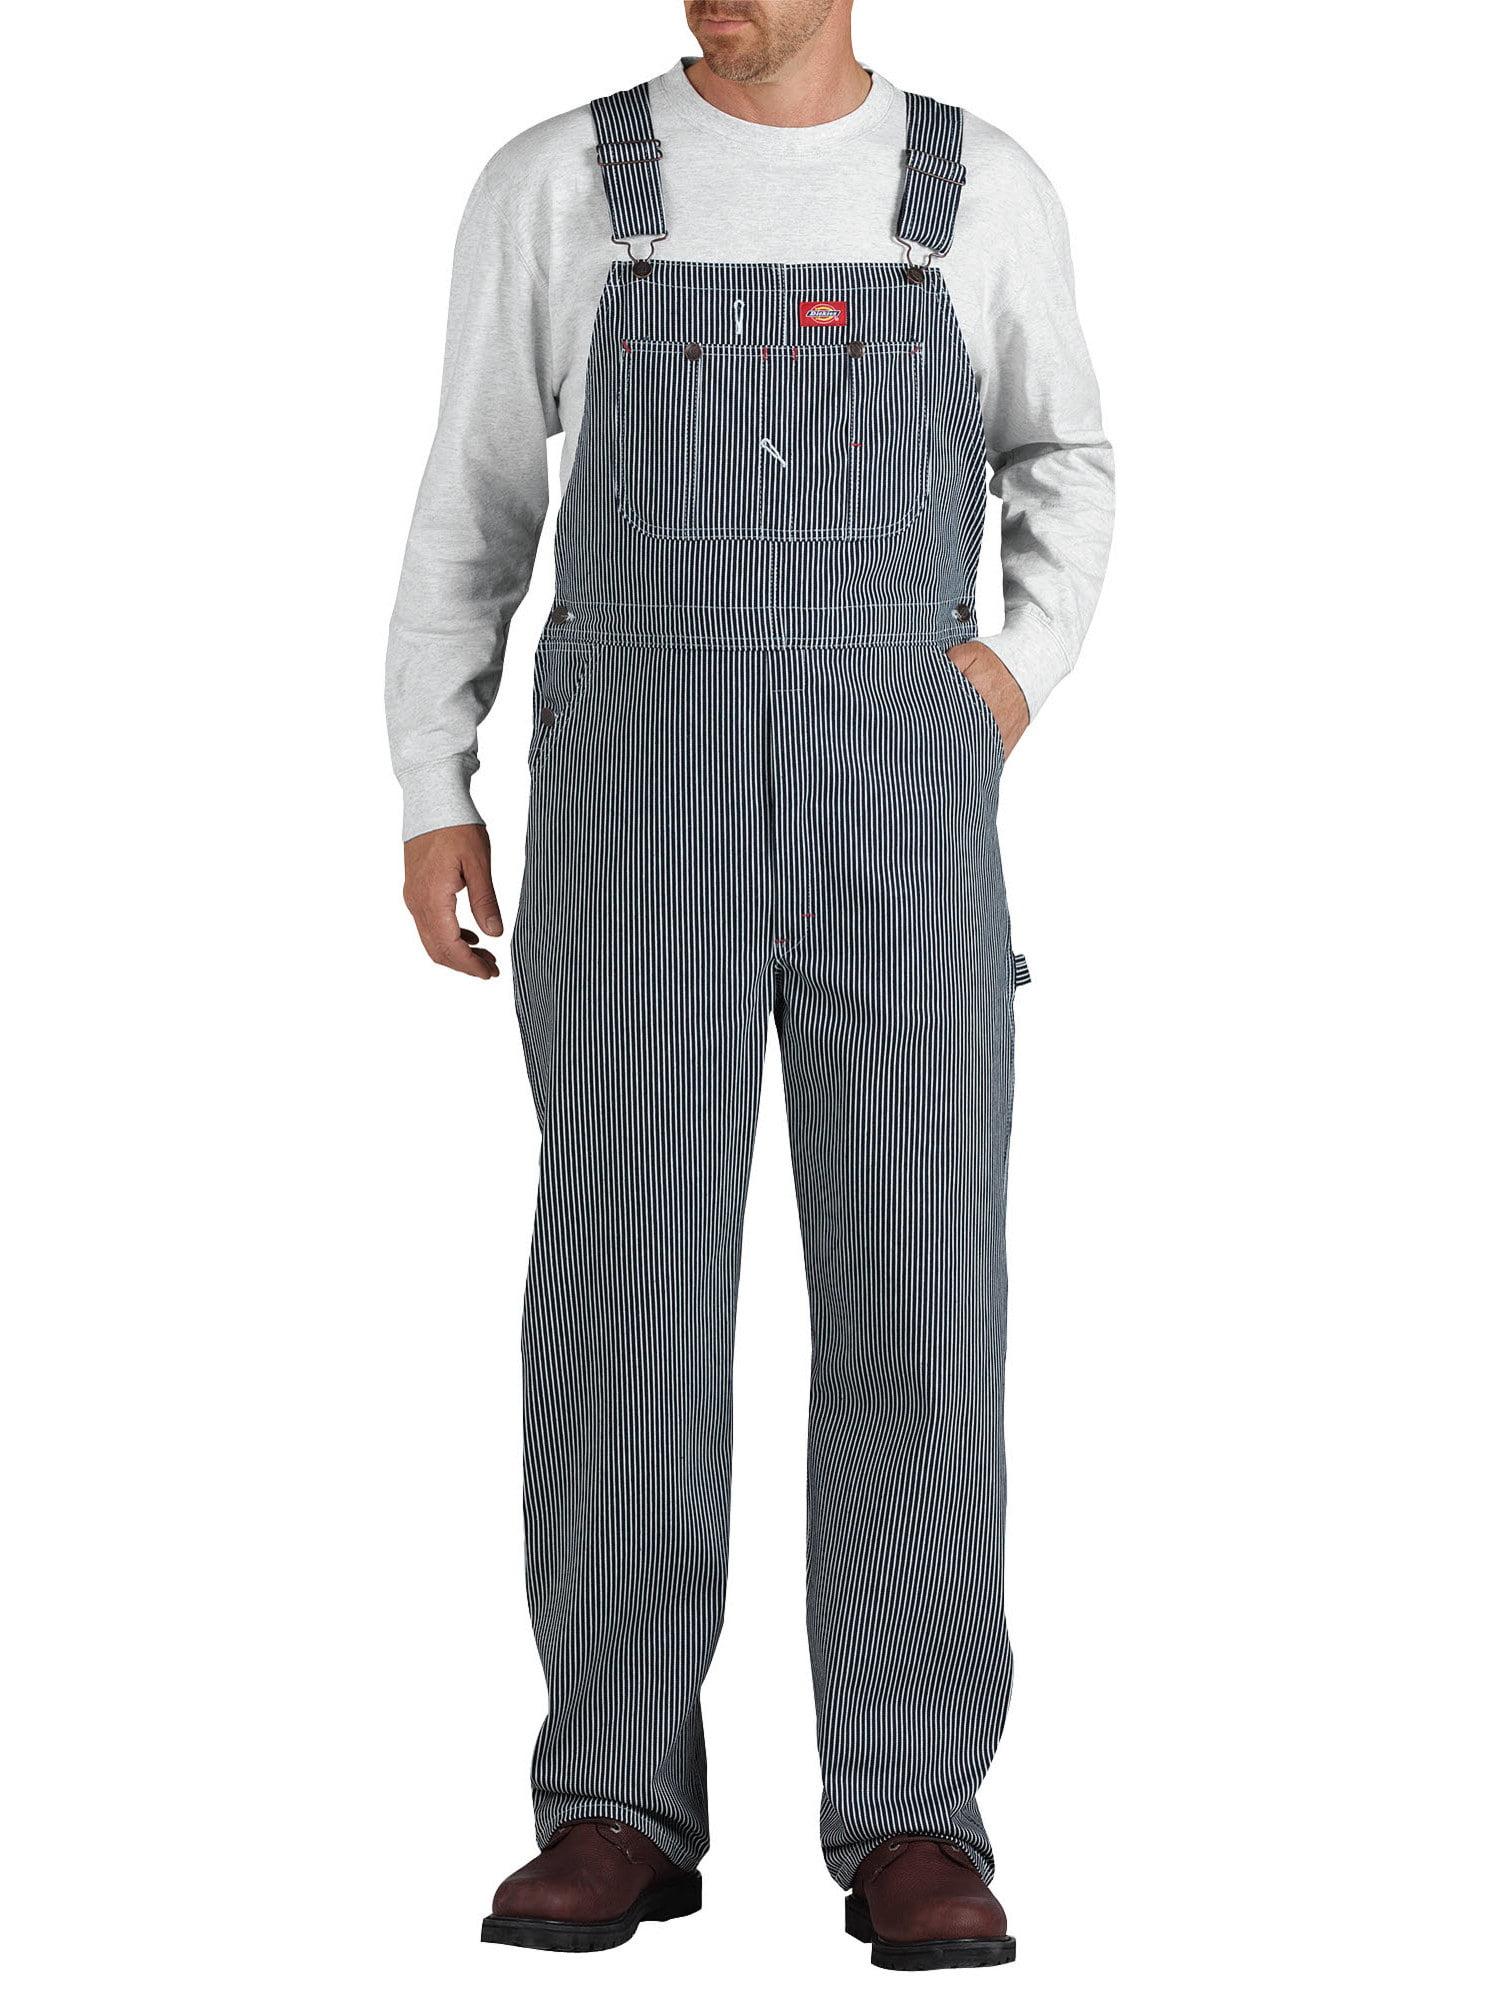 Men's Hickory Stripe Bib Overall